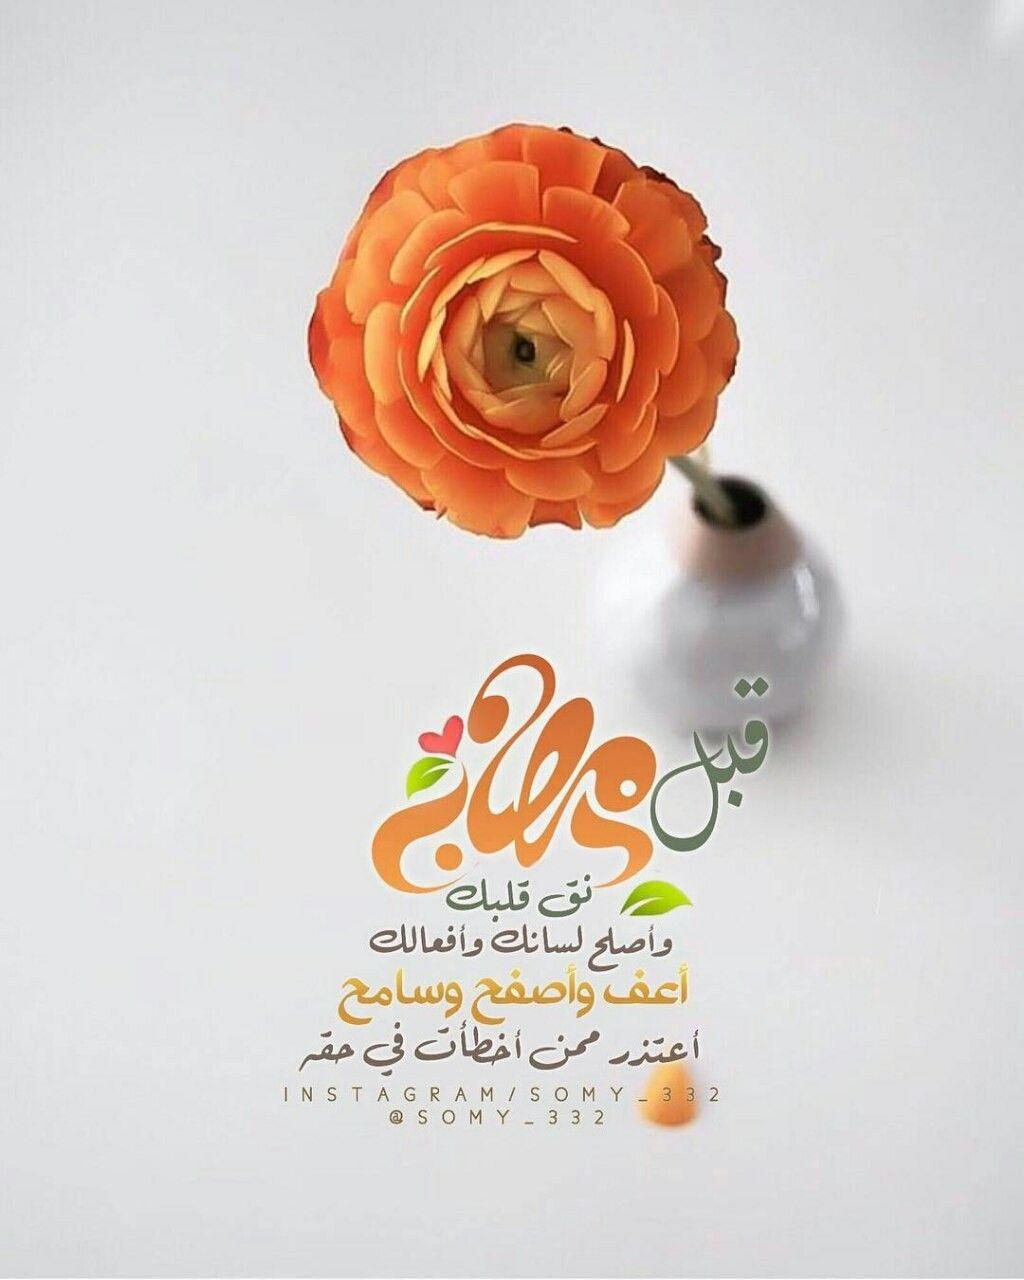 Pin By حماده جناده On أجيب دعوة الداعي Ramadan Greetings Ramadan Quotes Ramadan